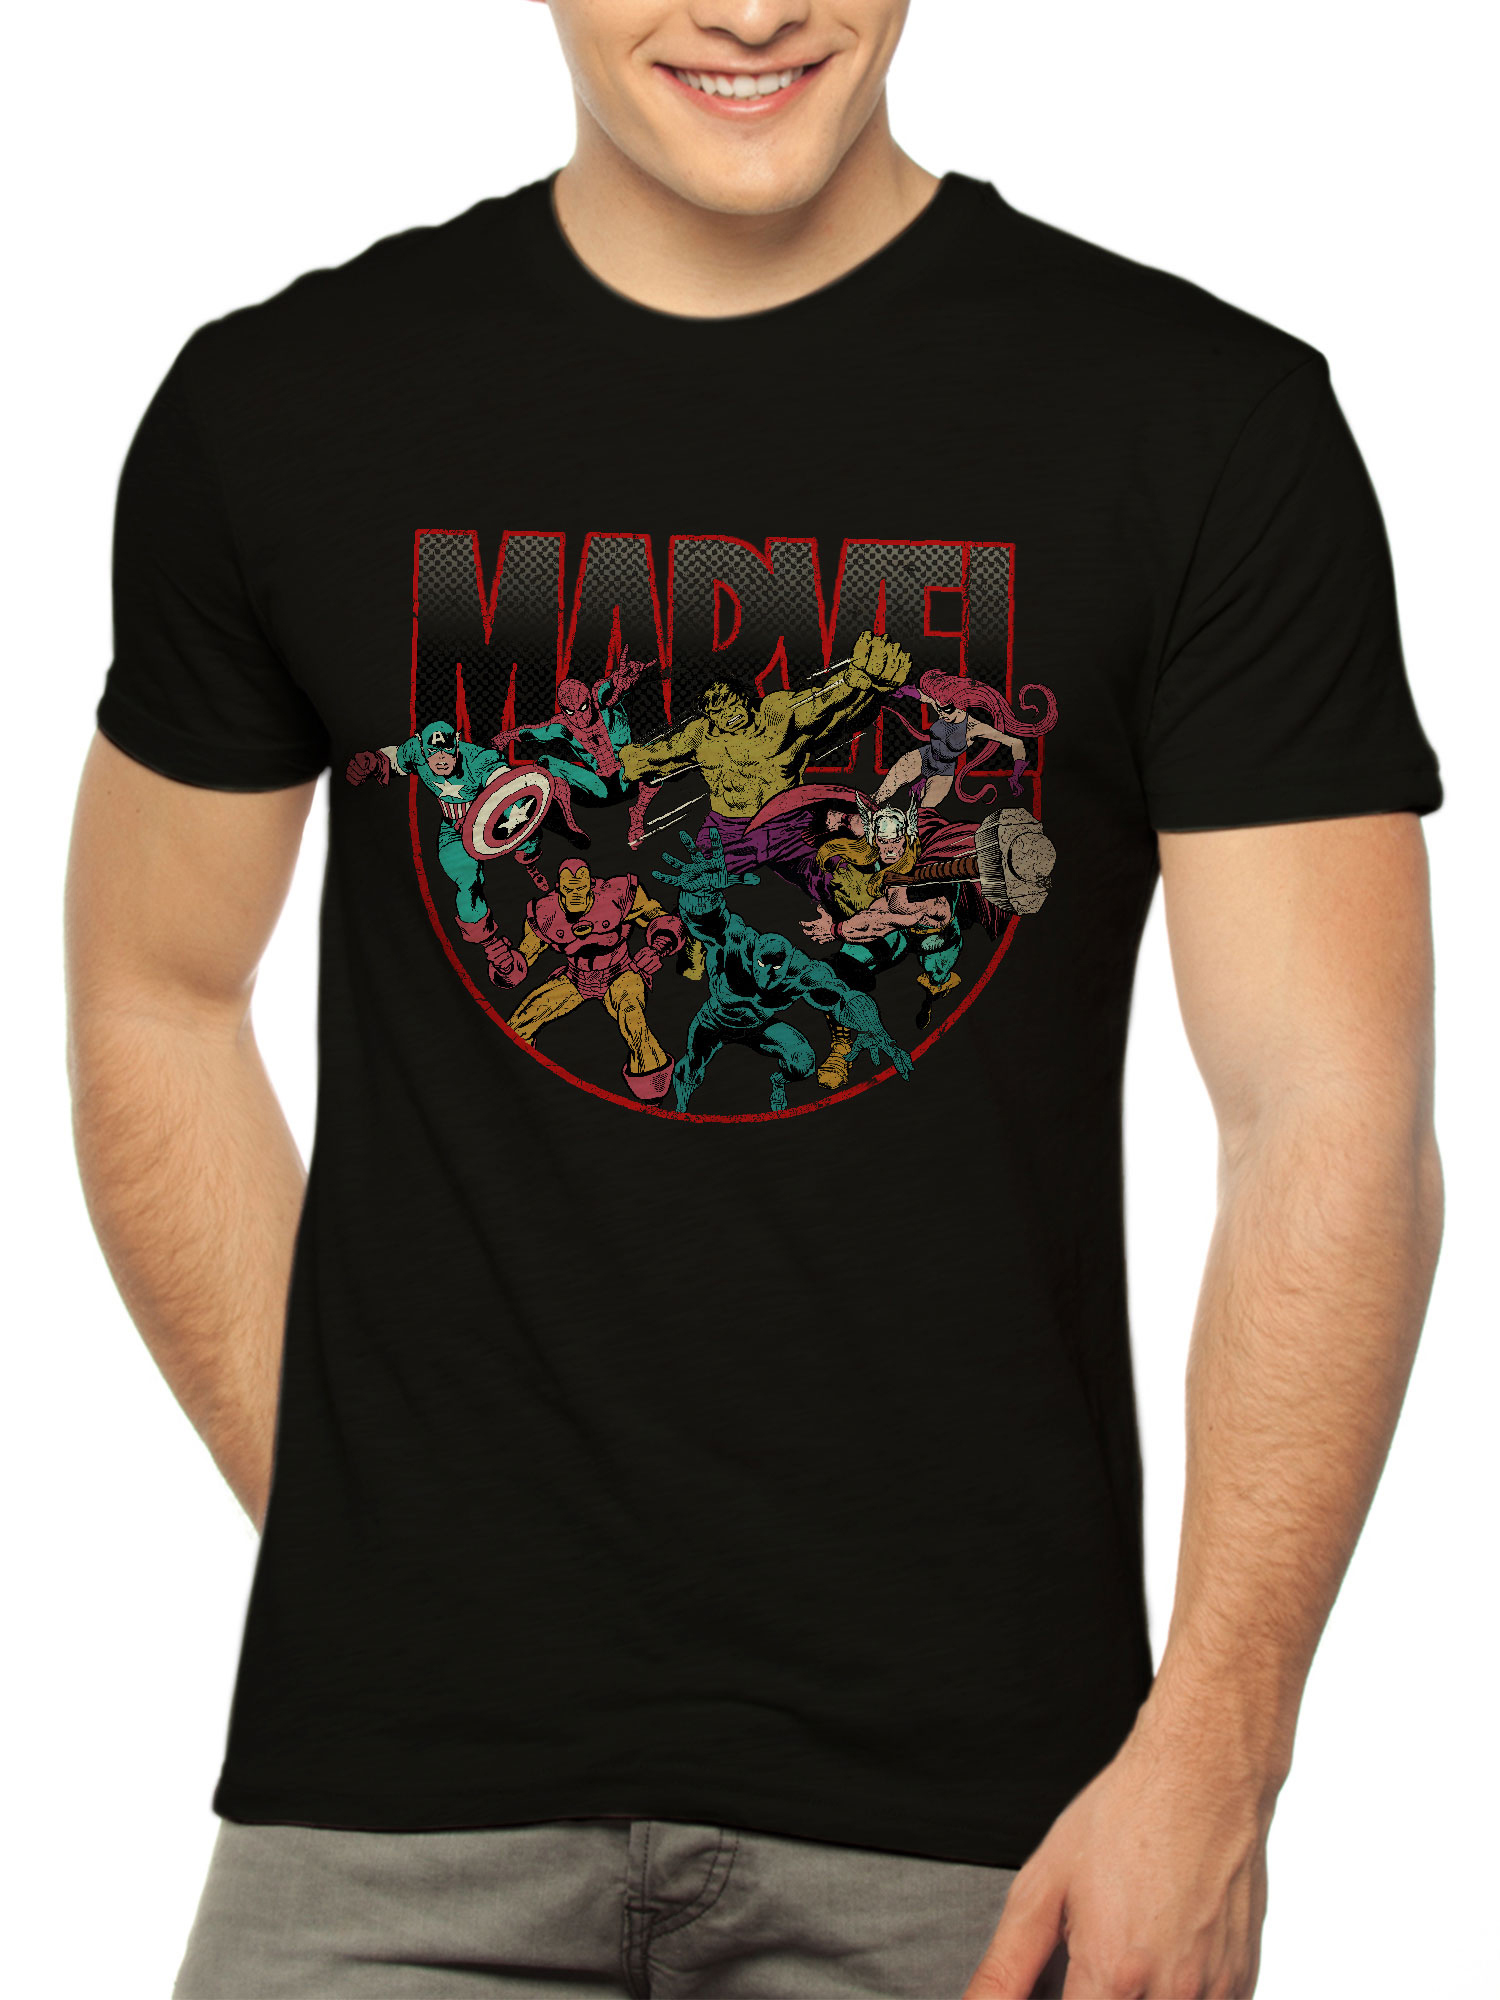 Marvel Avengers Comics Group Circle Shot Men's Graphic T-Shirt, up to Size 3XL